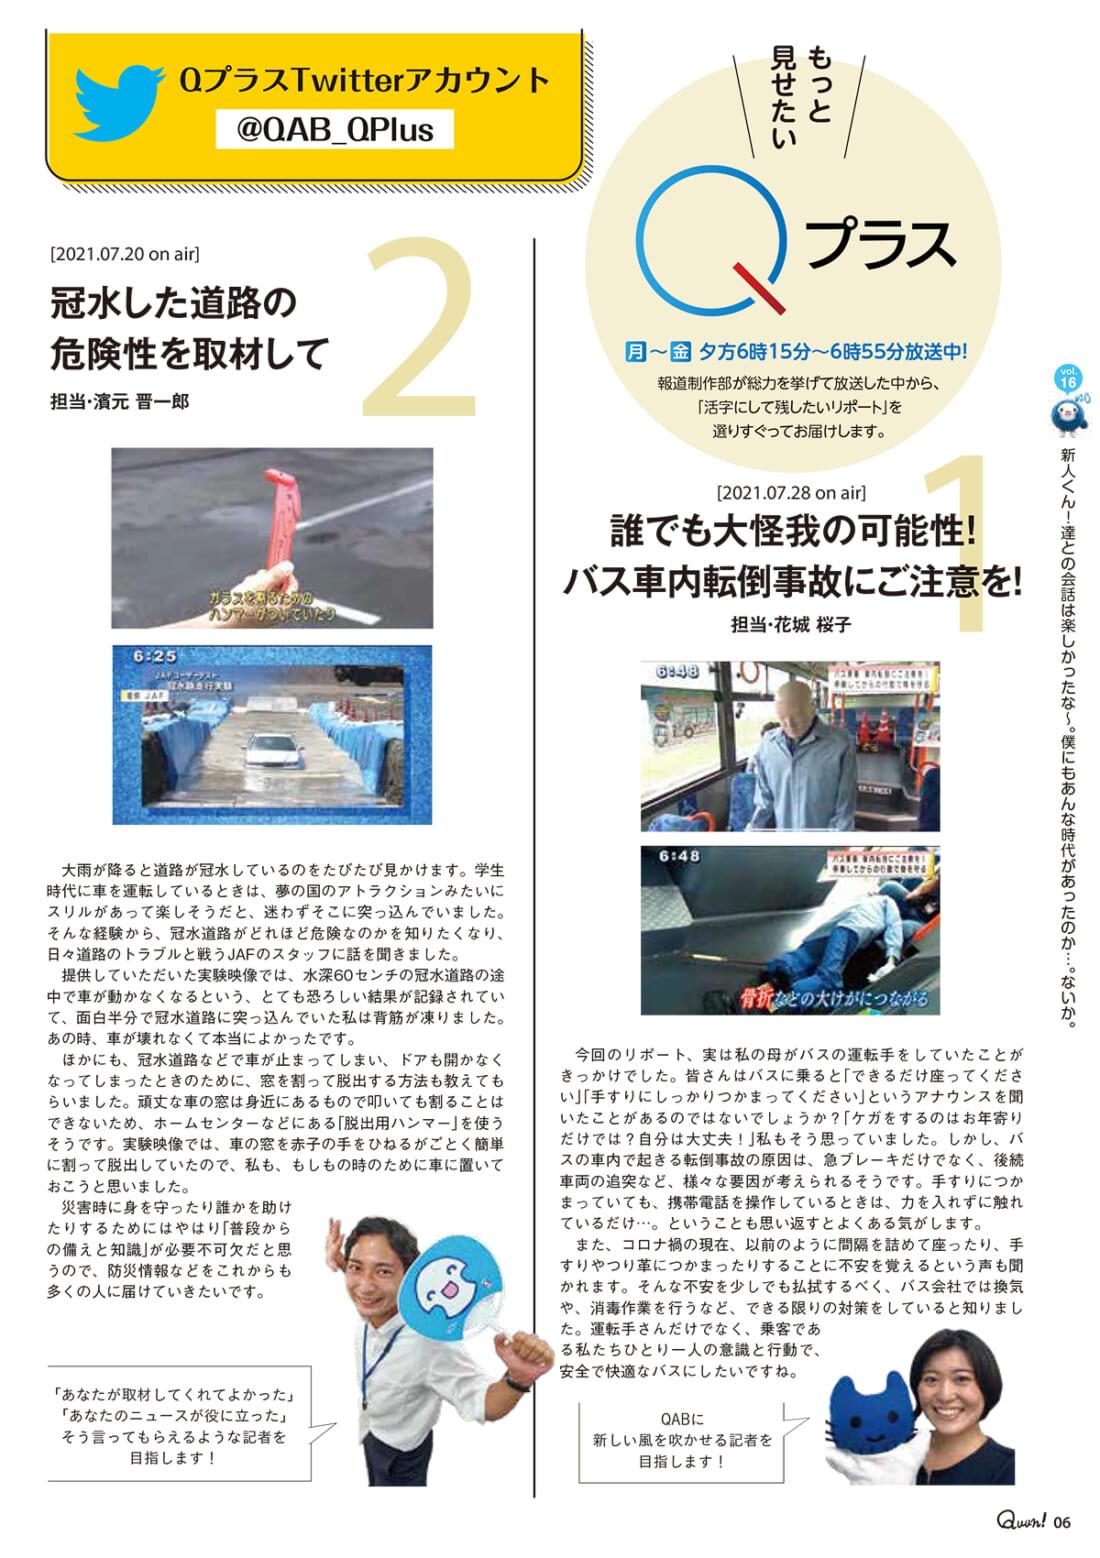 https://www.qab.co.jp/qgoro/wp-content/uploads/quun_1608-1100x1558.jpg